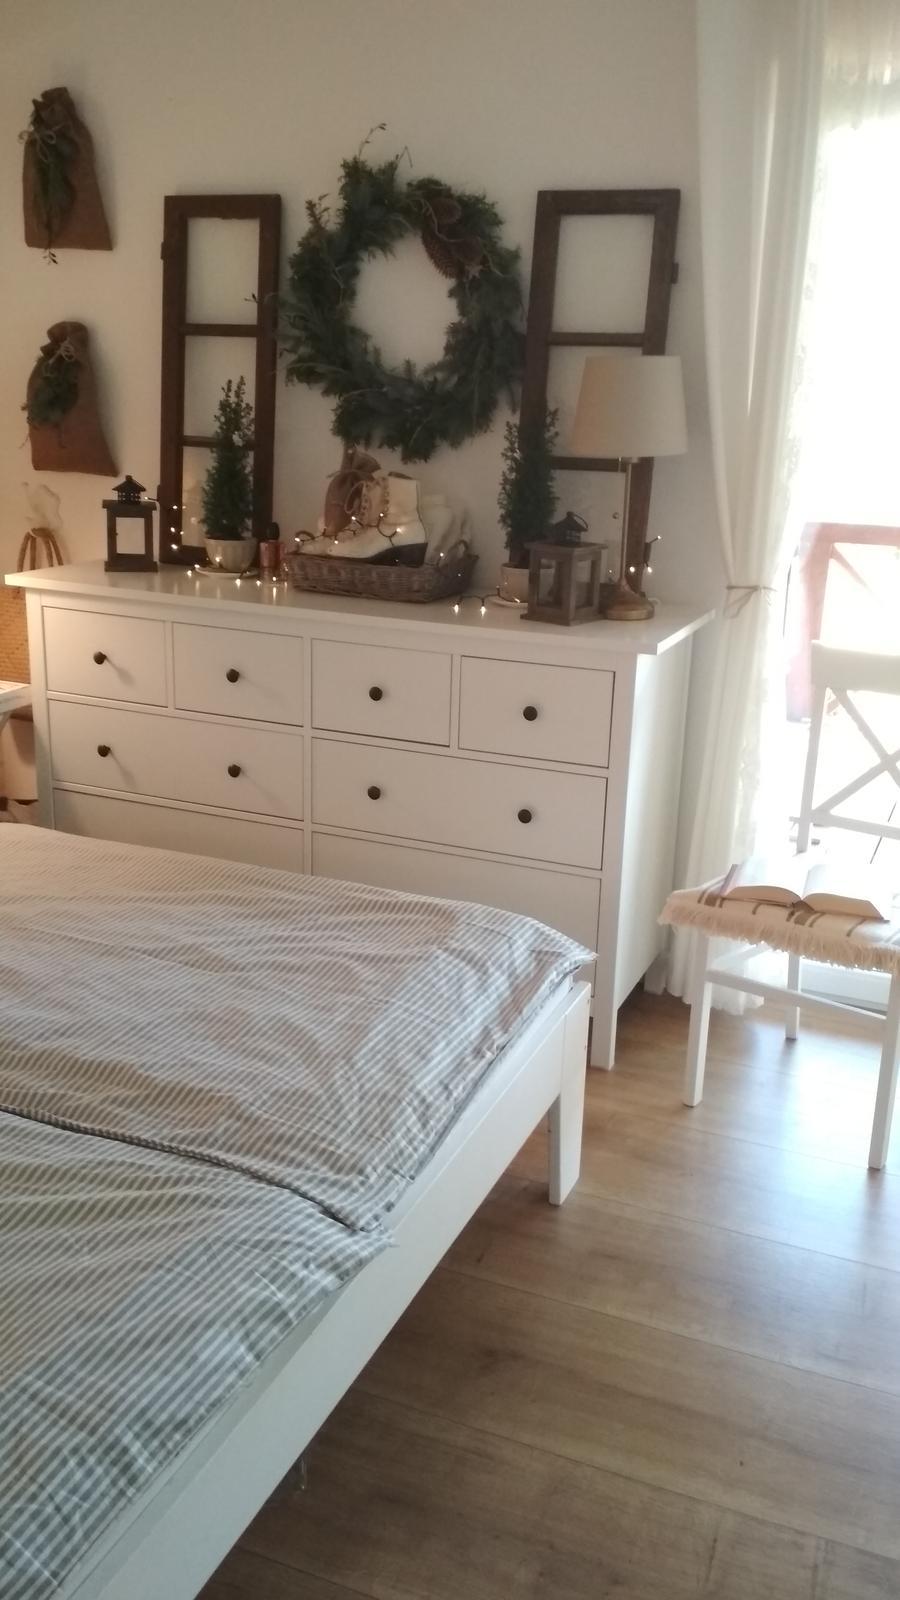 Spálňa - zmena - Obrázok č. 43